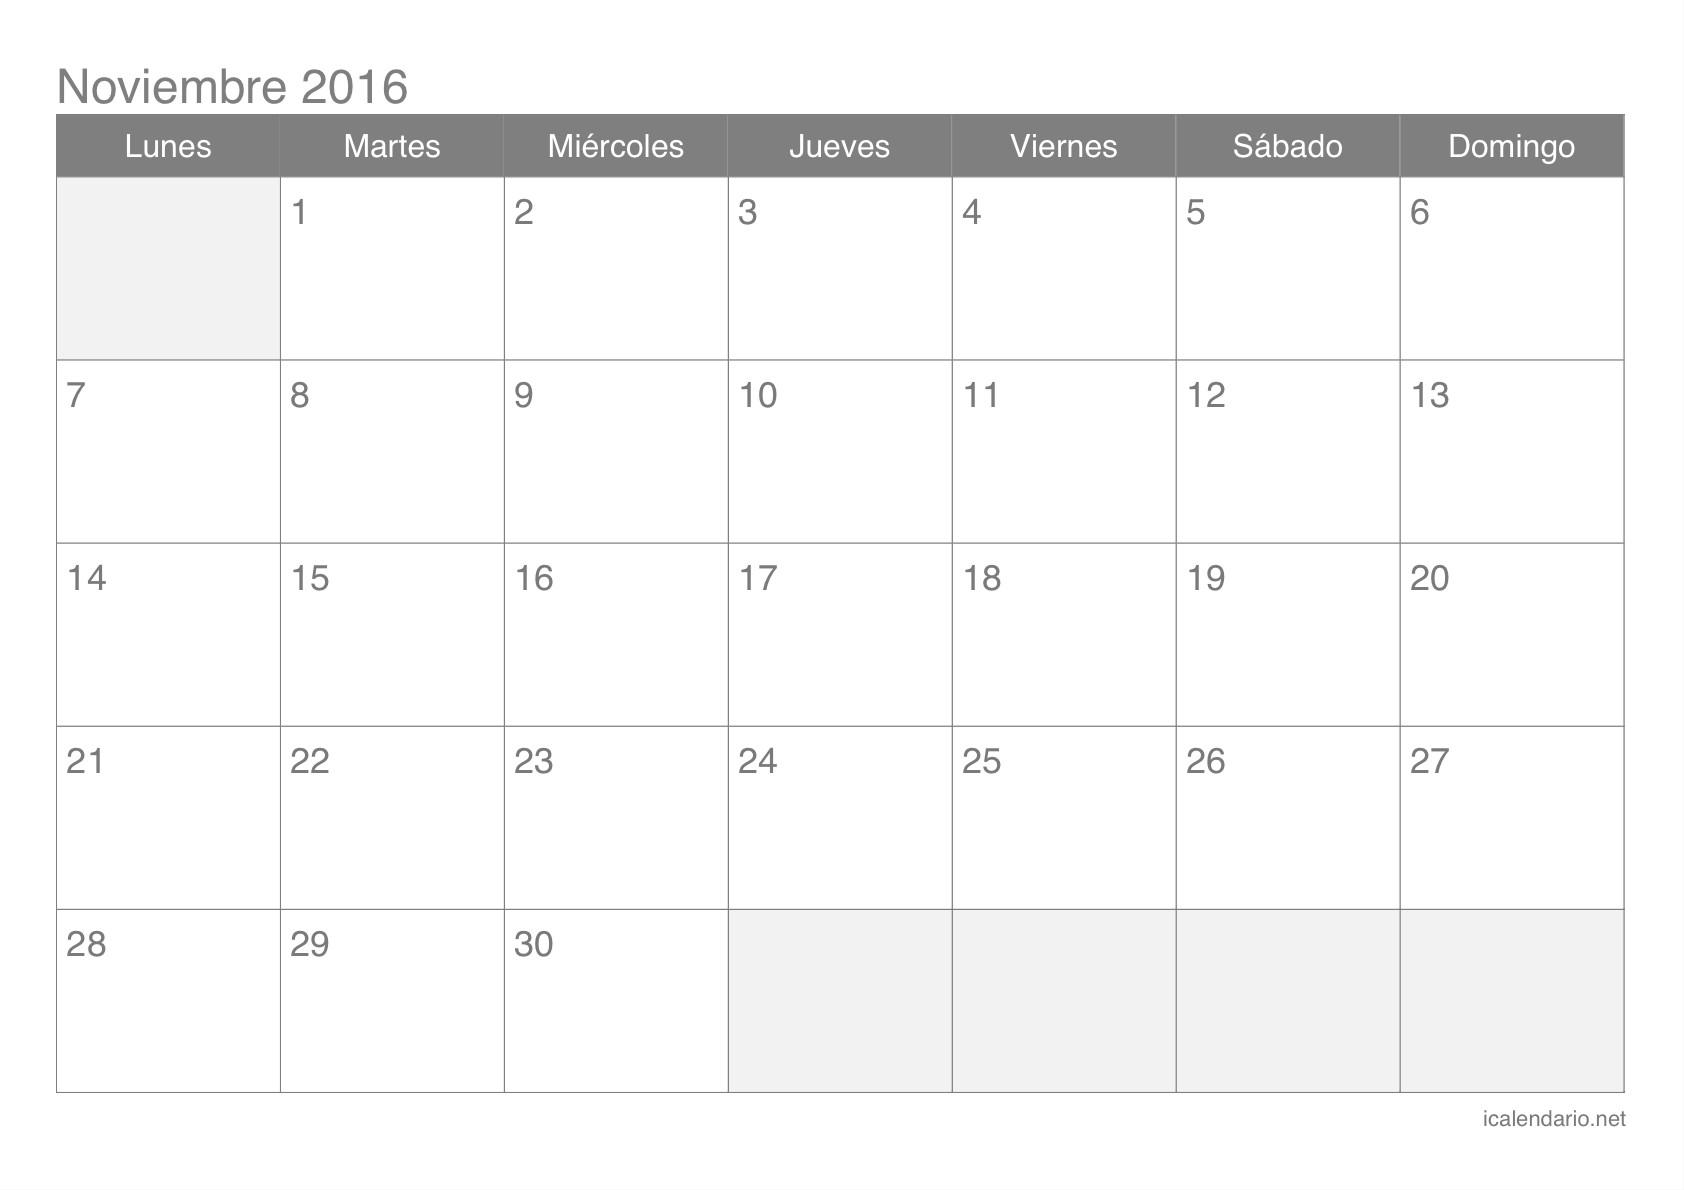 Imprimir Calendario Diciembre 2019 Actual Calendario 2016 Excel Calendario Mensual 2015 Excel Calendario Of Imprimir Calendario Diciembre 2019 Recientes Observar Calendario Para Imprimir 2019 Pdf